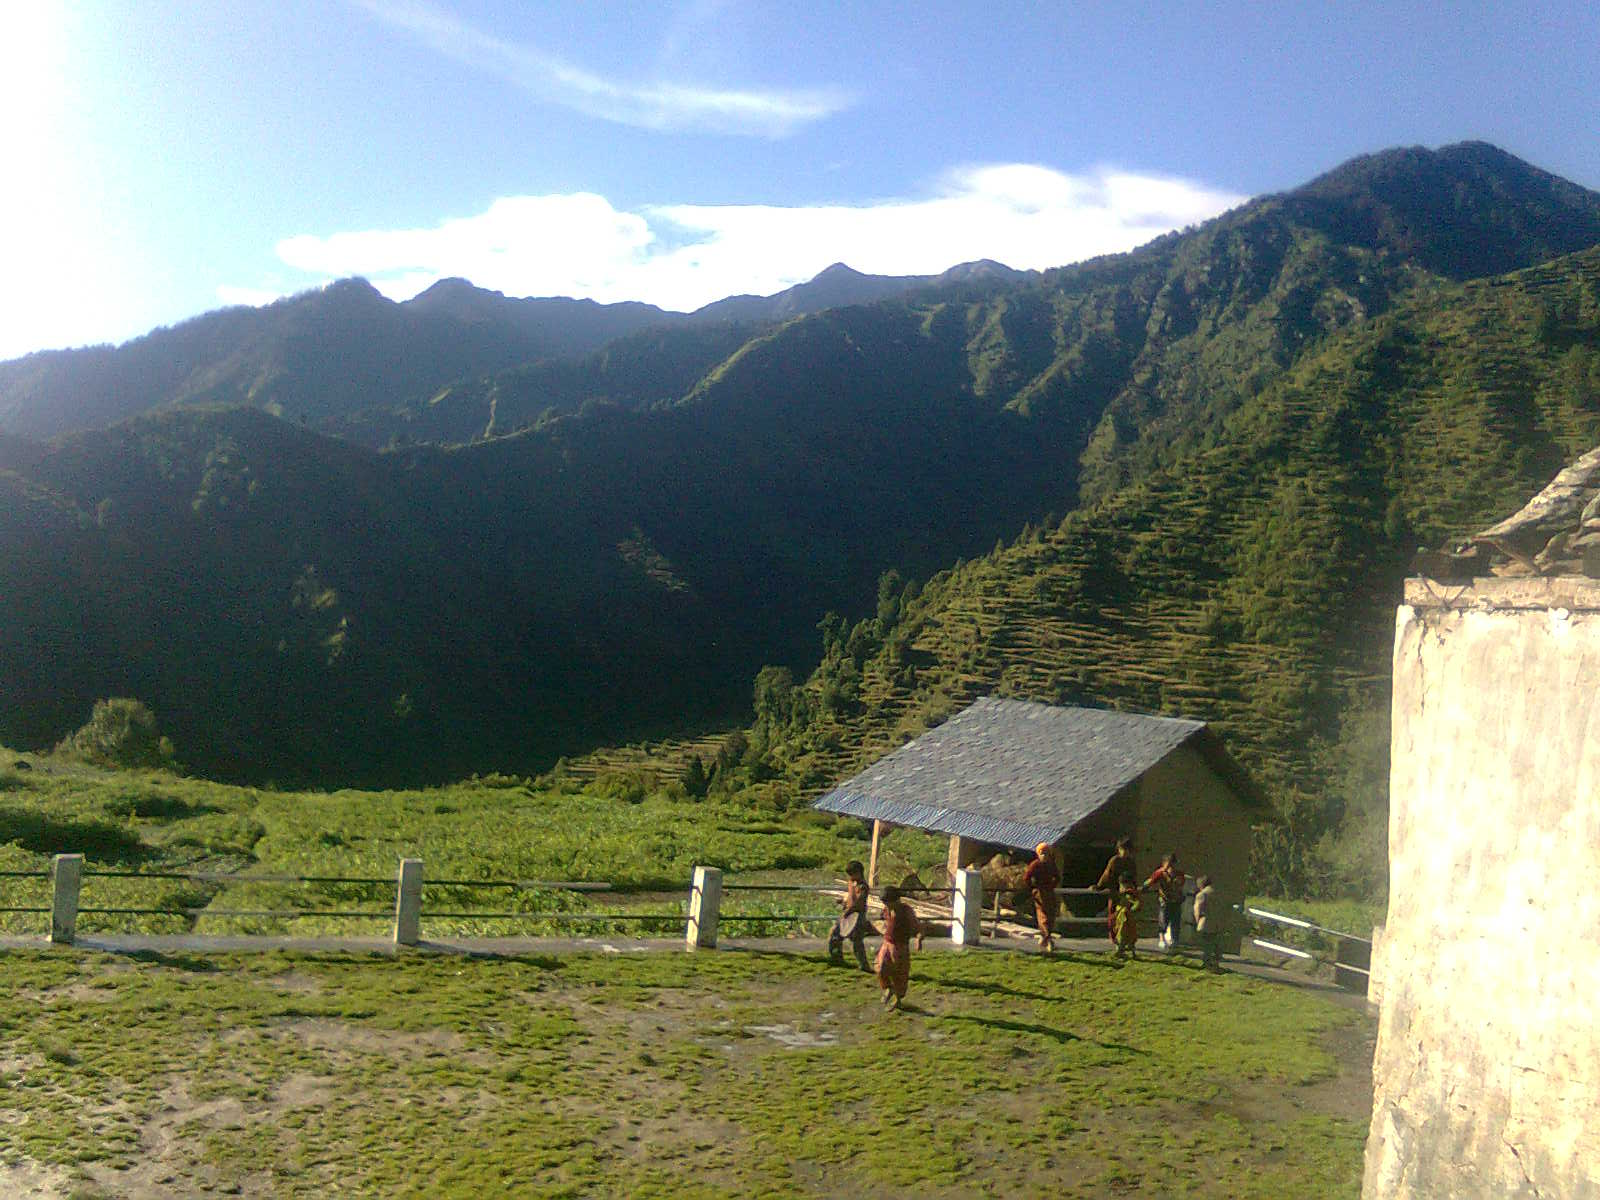 Barot valley in Himachal